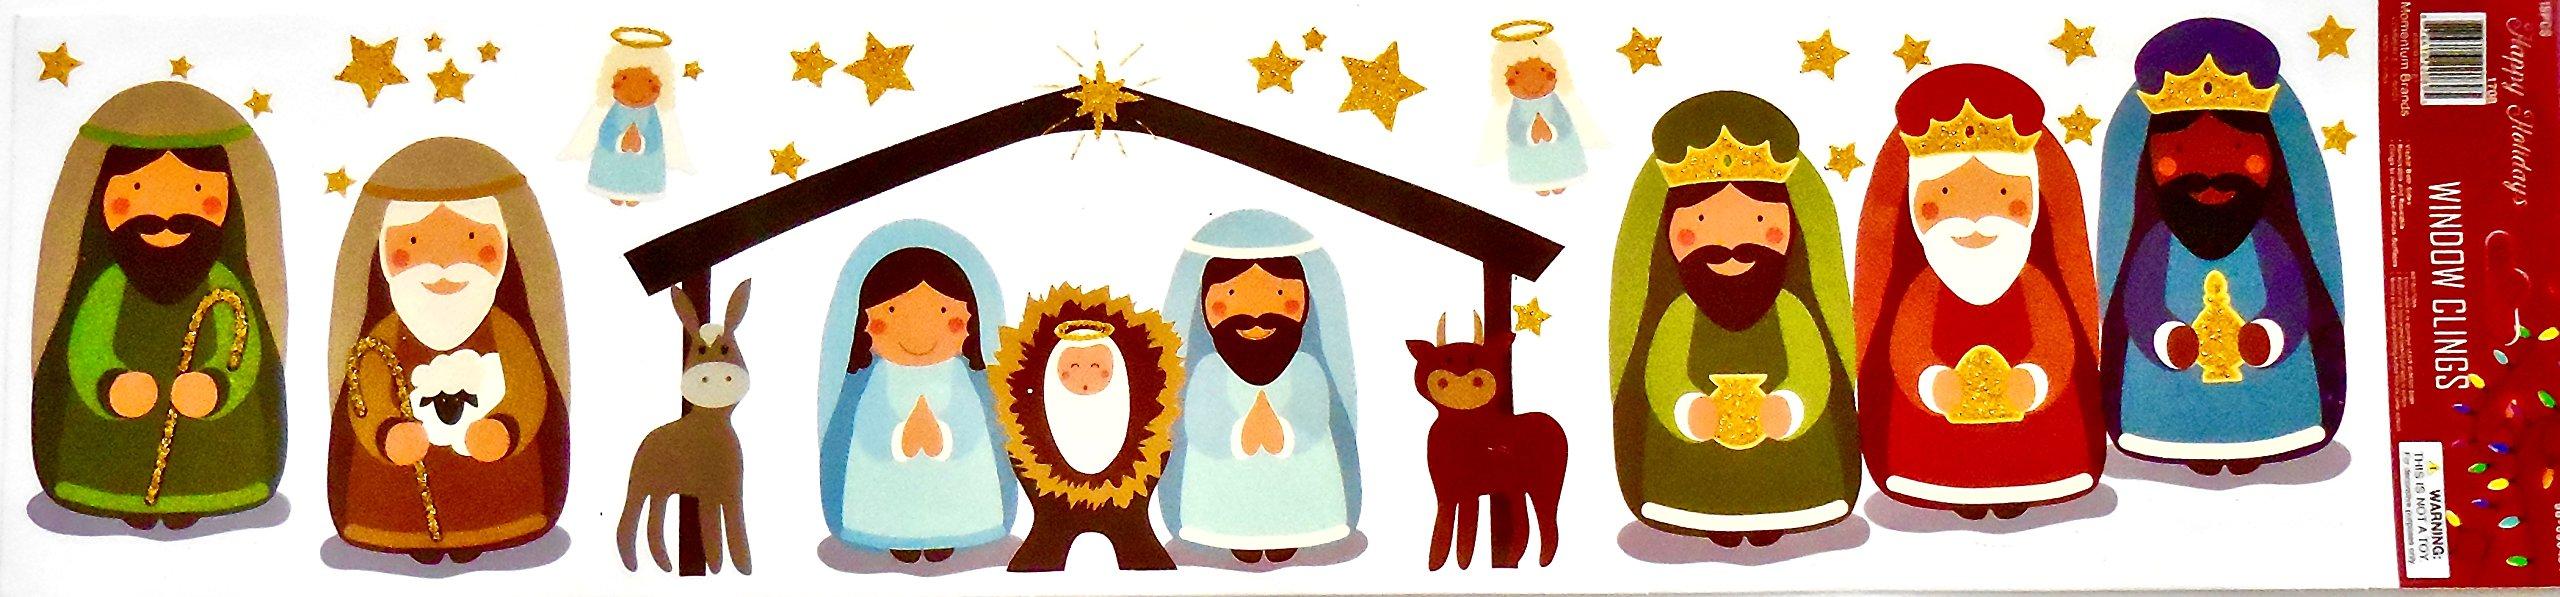 Happy Holidays Christmas Manger Scene Window Cling,Manger,Wise Men,Angels,Stars,Animals